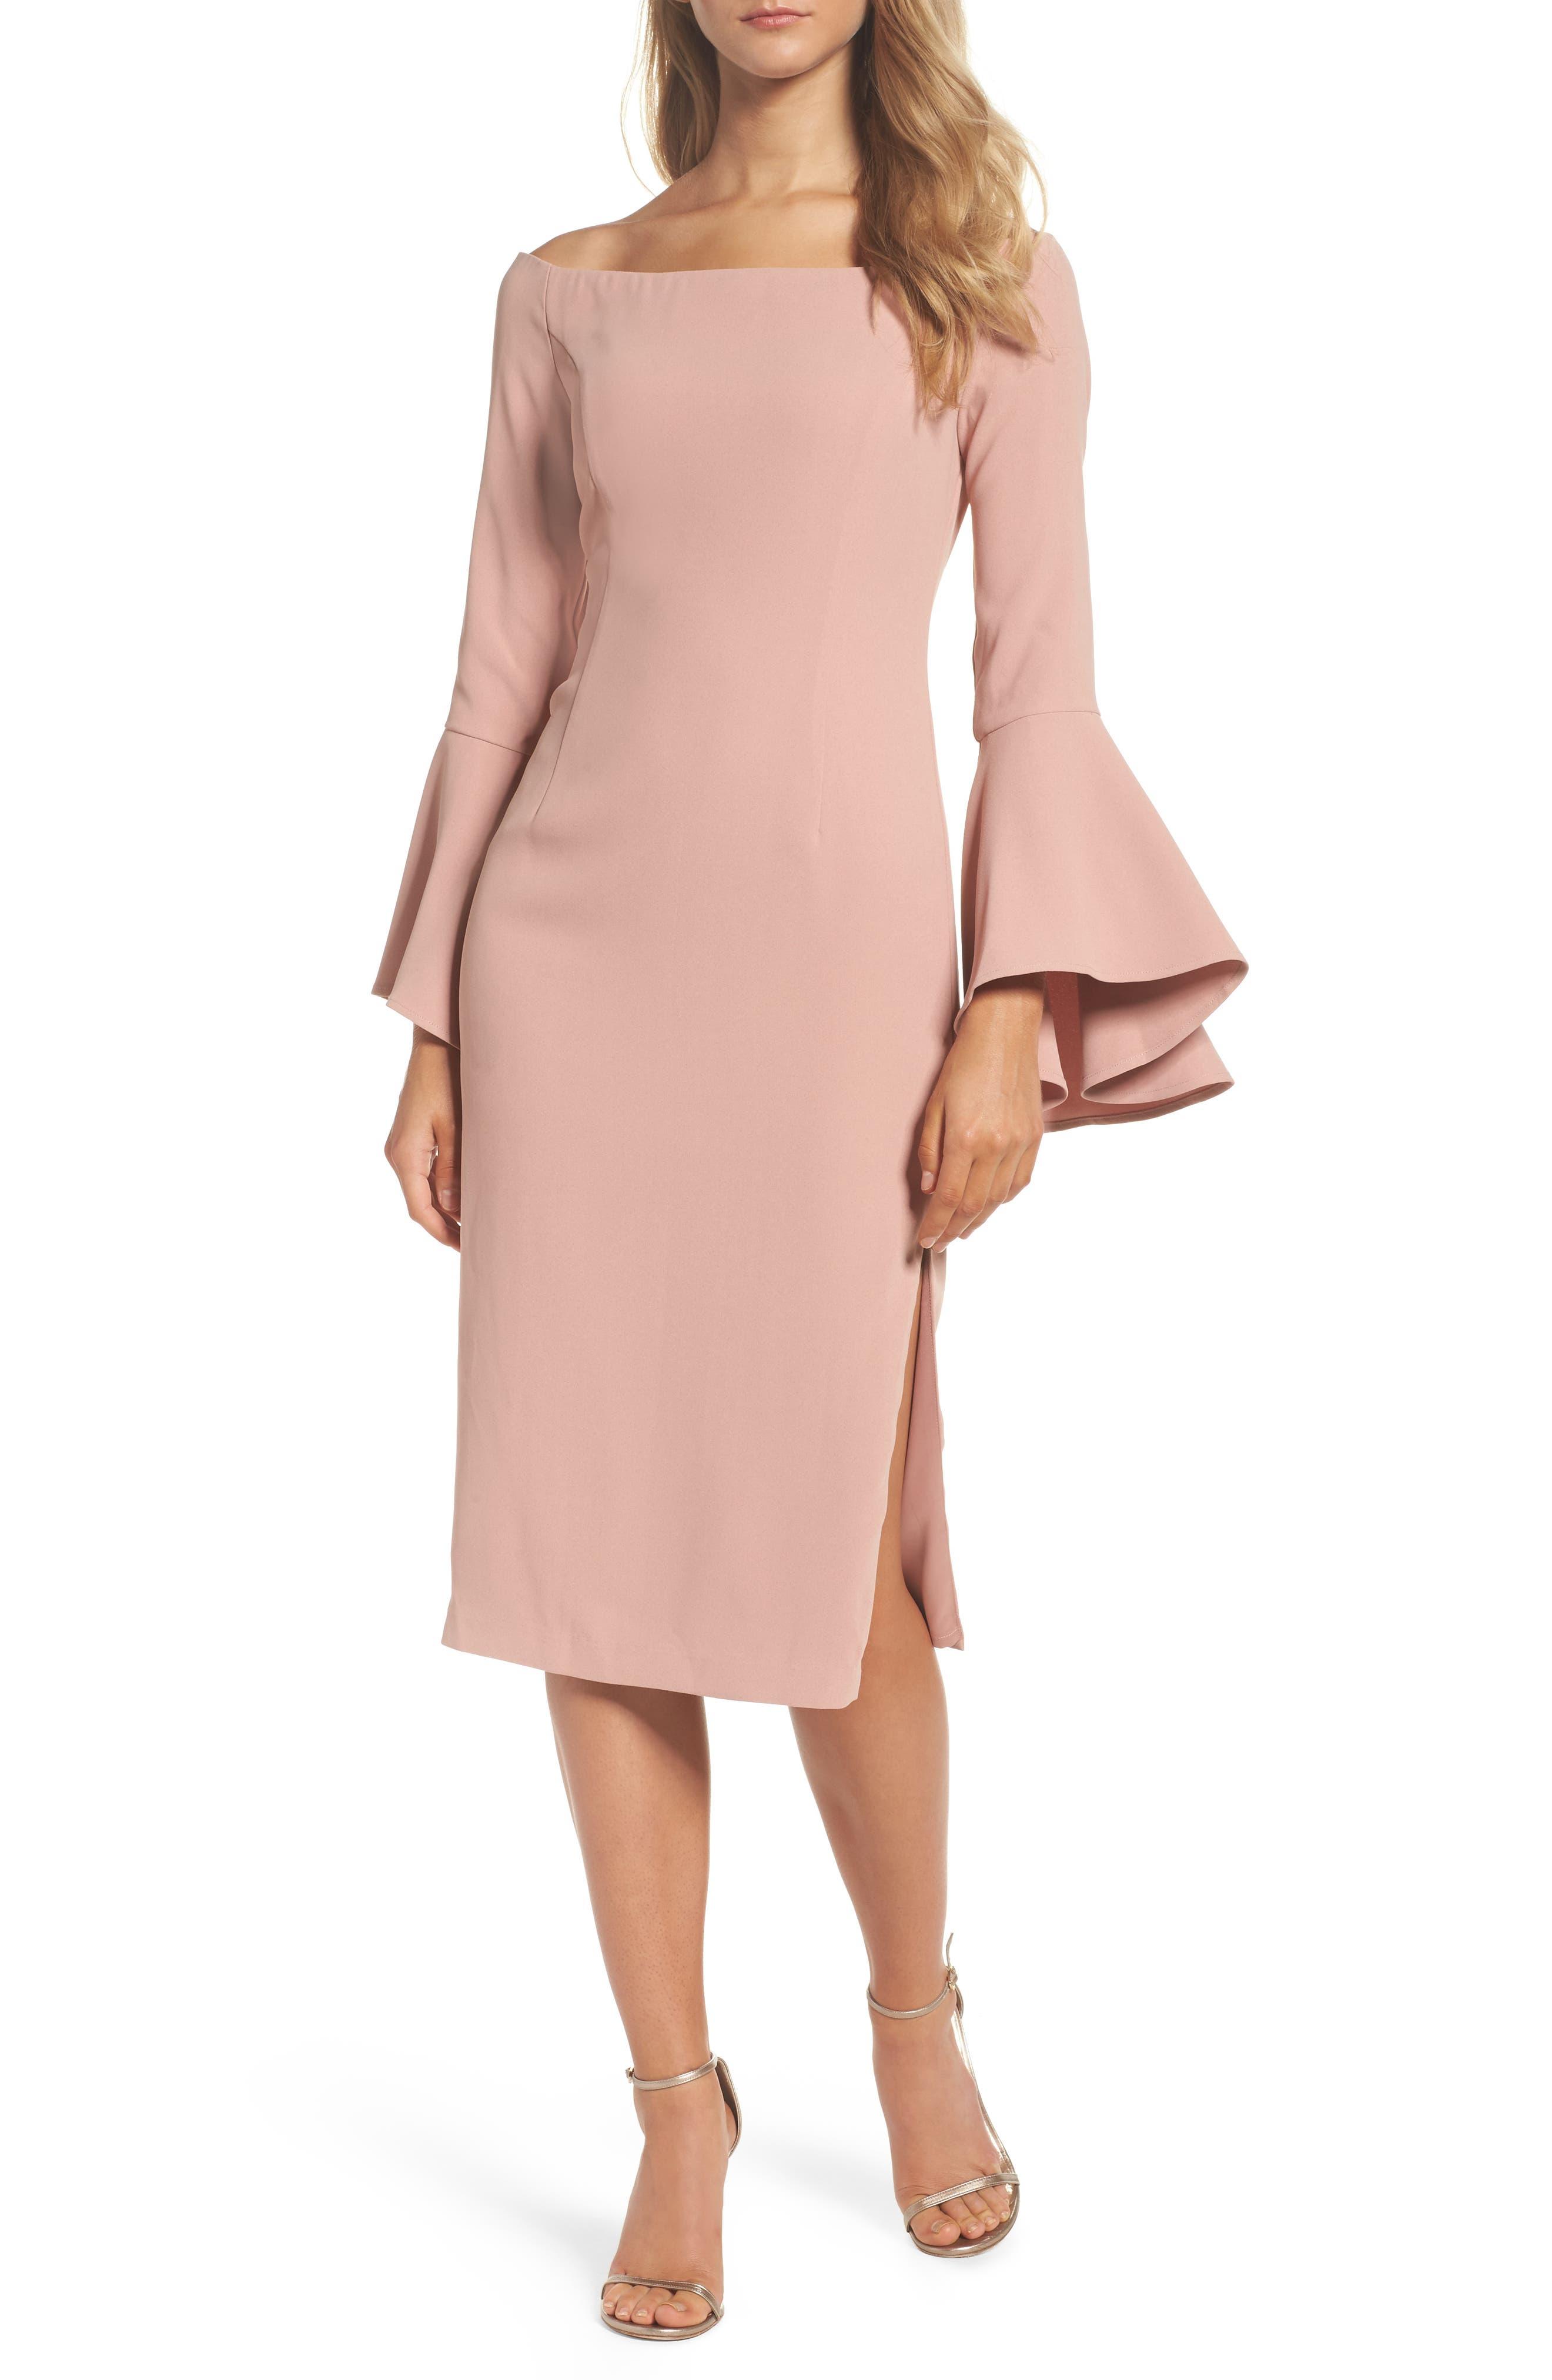 'Solange' Off the Shoulder Midi Dress,                             Alternate thumbnail 19, color,